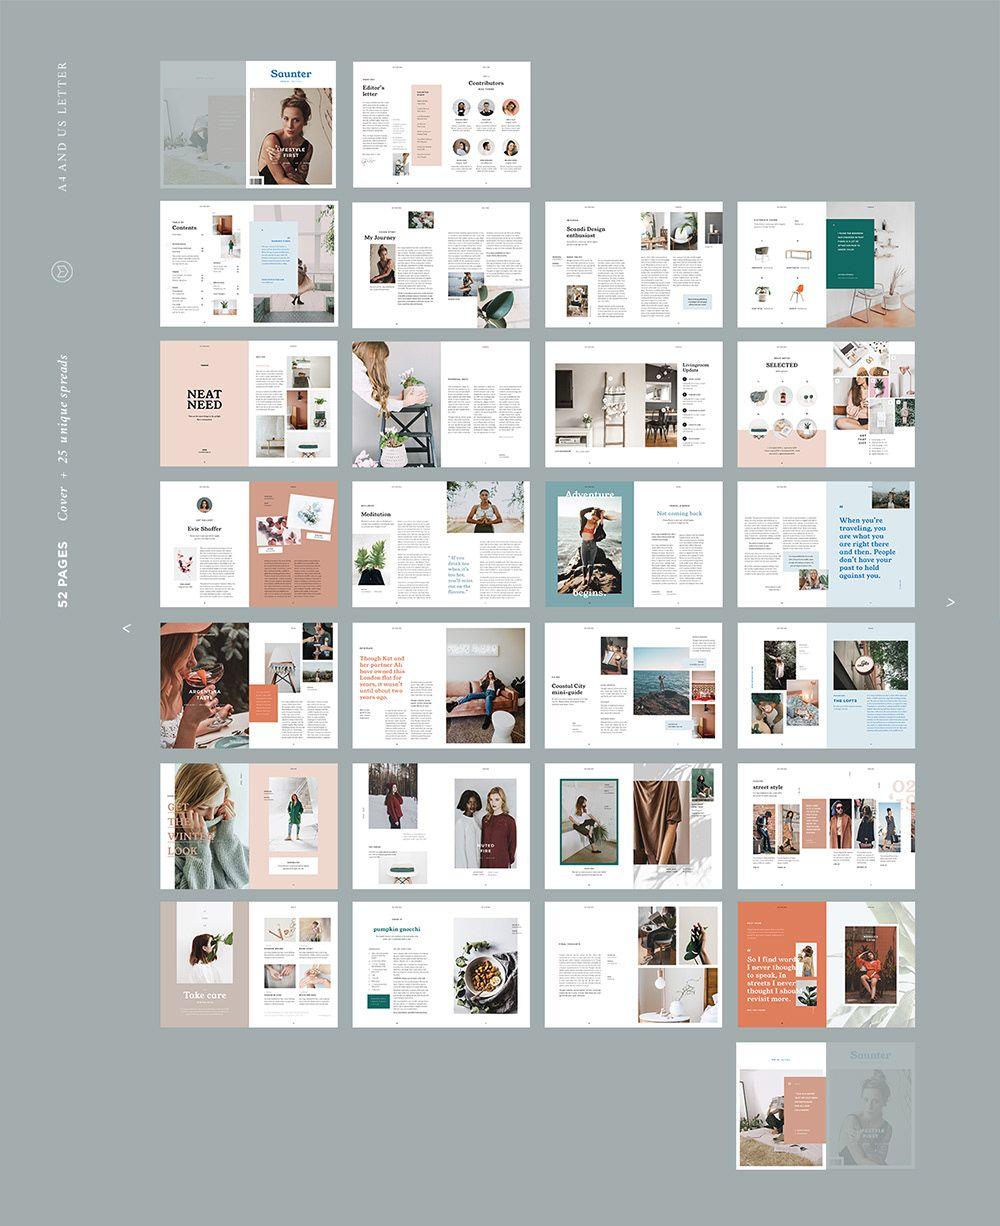 Free Indesign Magazine Templates: Indesign Magazine Templates